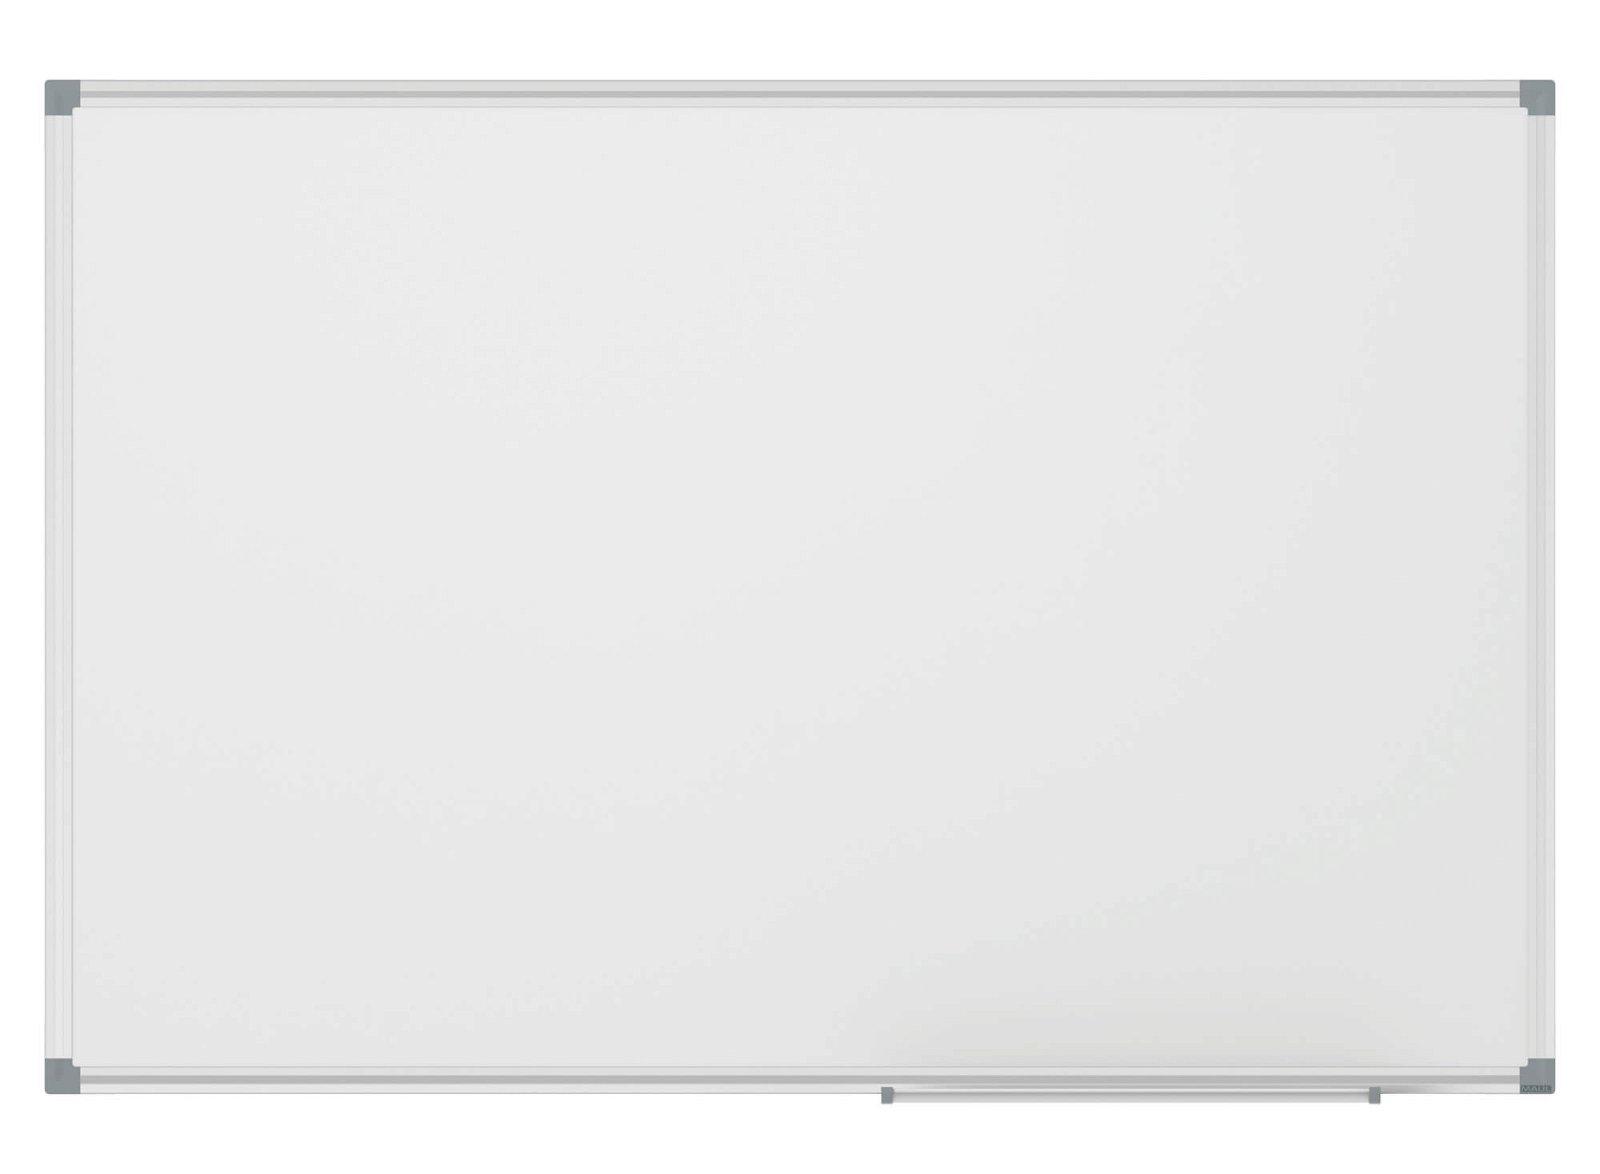 Whiteboard MAULstandard, 90x180 cm, grau